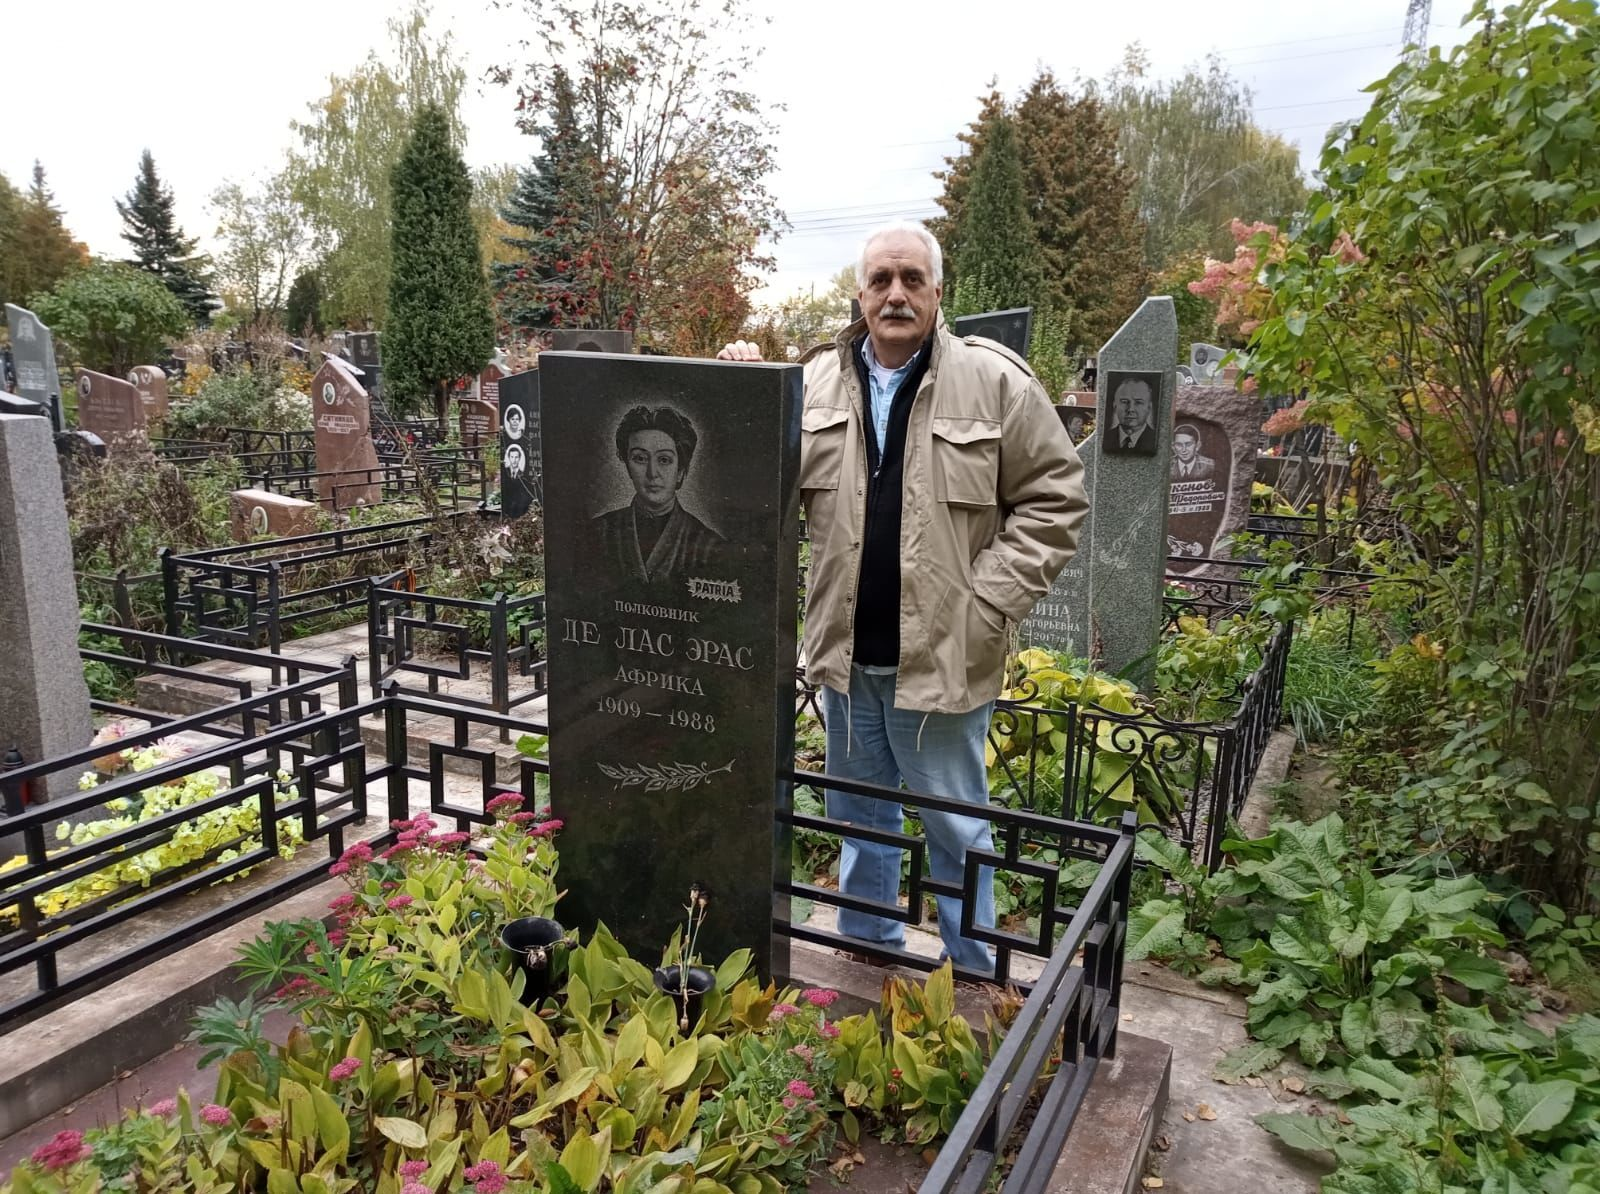 el escritor uruguayo Raúl Vallarino visita la tumba de la española África de las Heras